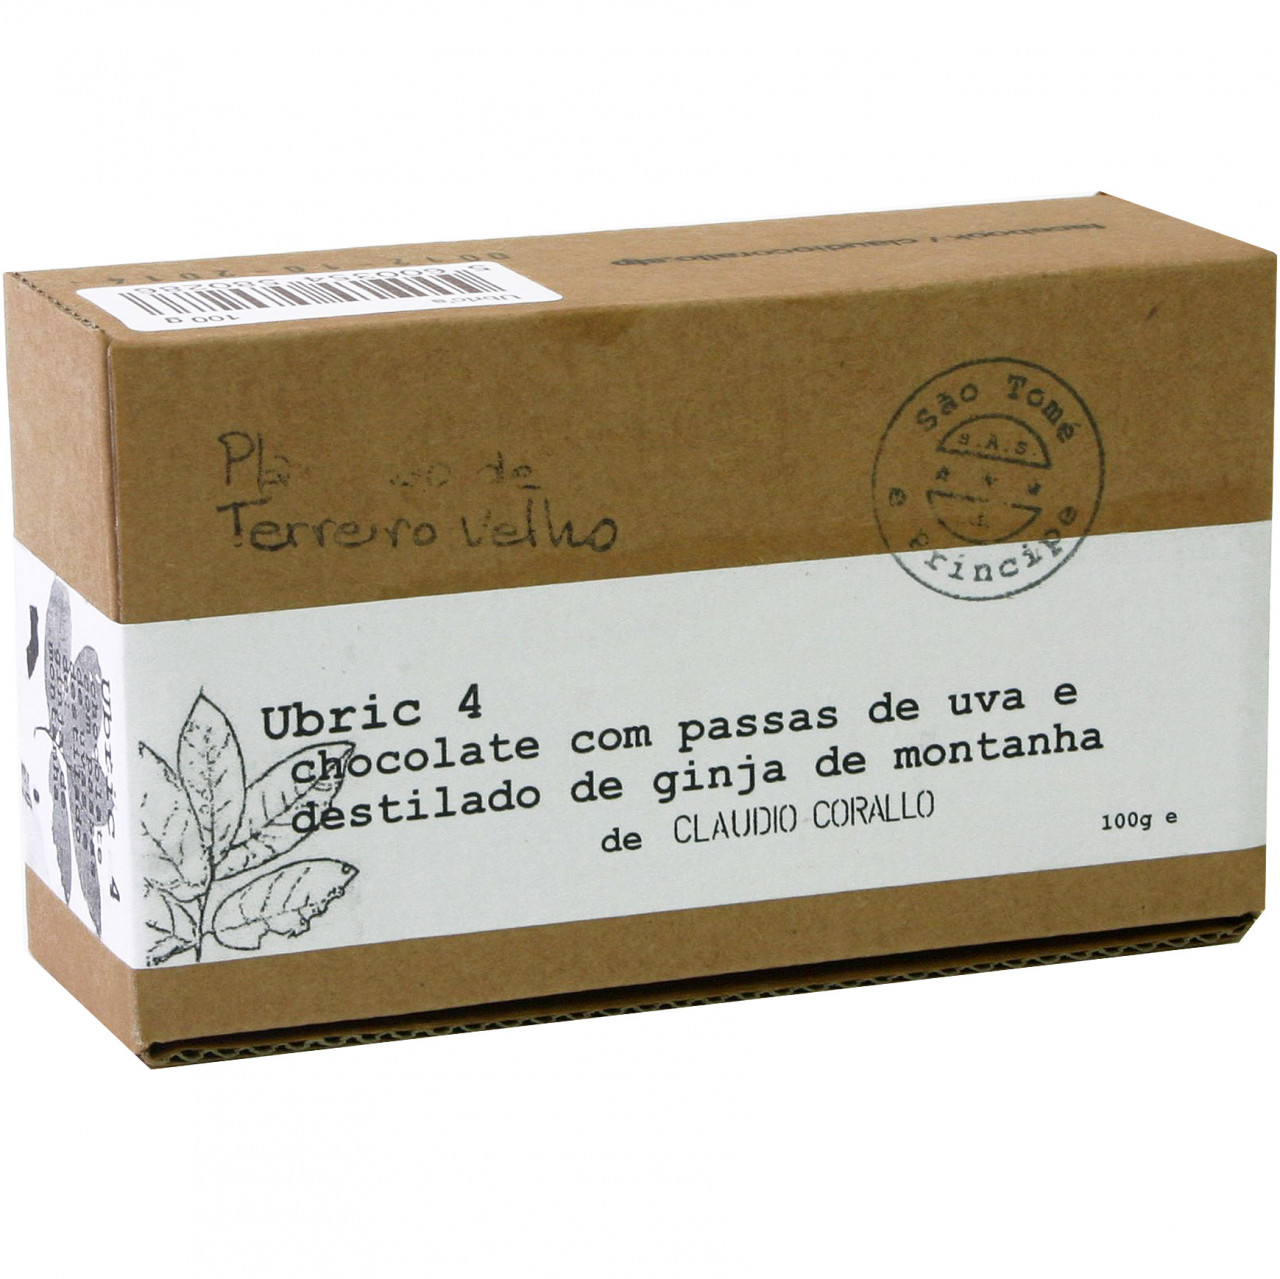 dark chocolate, chocolat noir, mit Alkohol, Sauerkirschen, Rosinen, raisin,                                                                                                                              - Barras de chocolate, Sao Tome, Sao Tome Chocolate, Chocolate con alcohol - Chocolats-De-Luxe